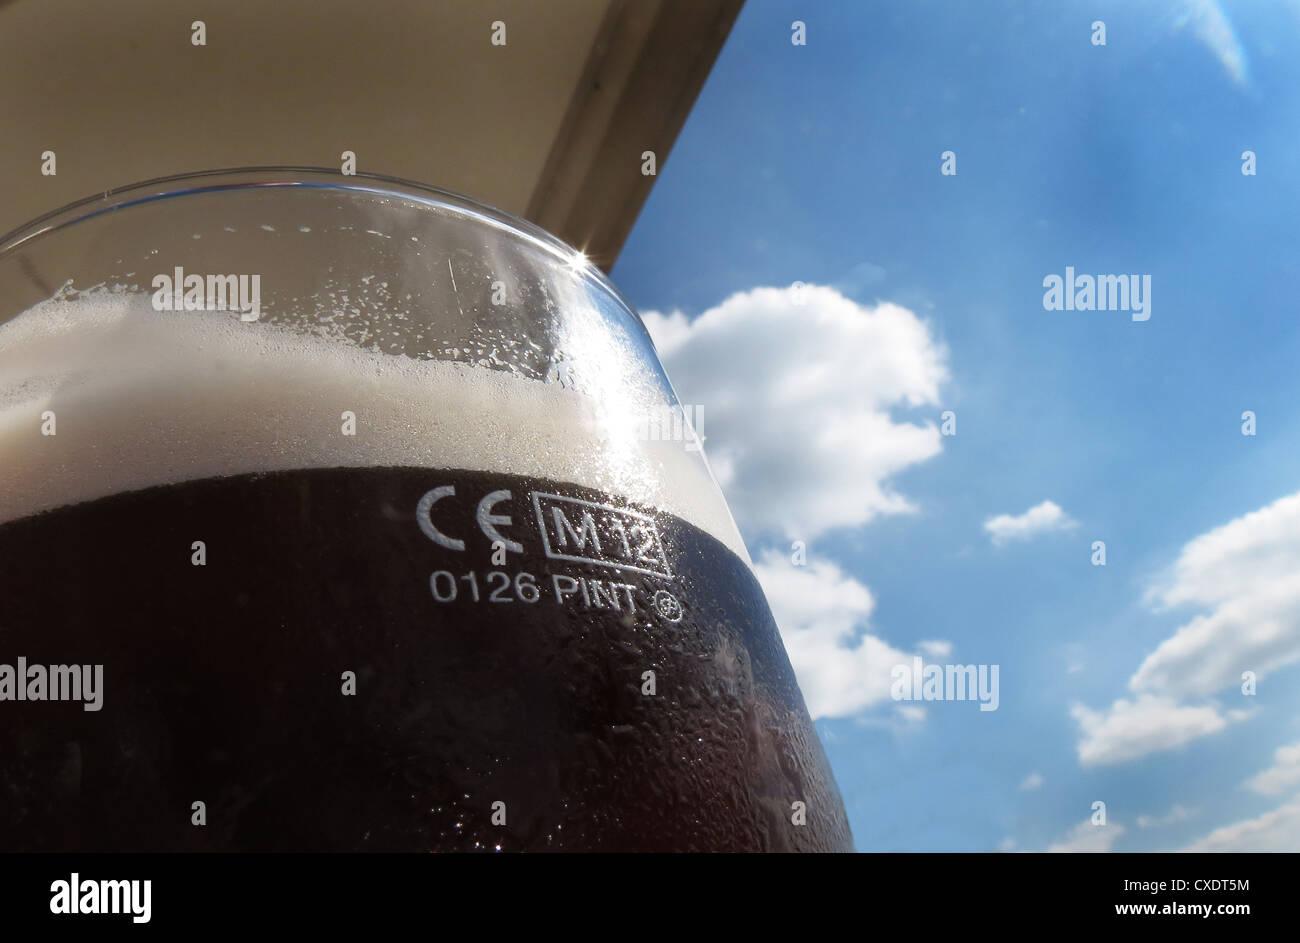 Detail of measure of UK beer pint glass. - Stock Image